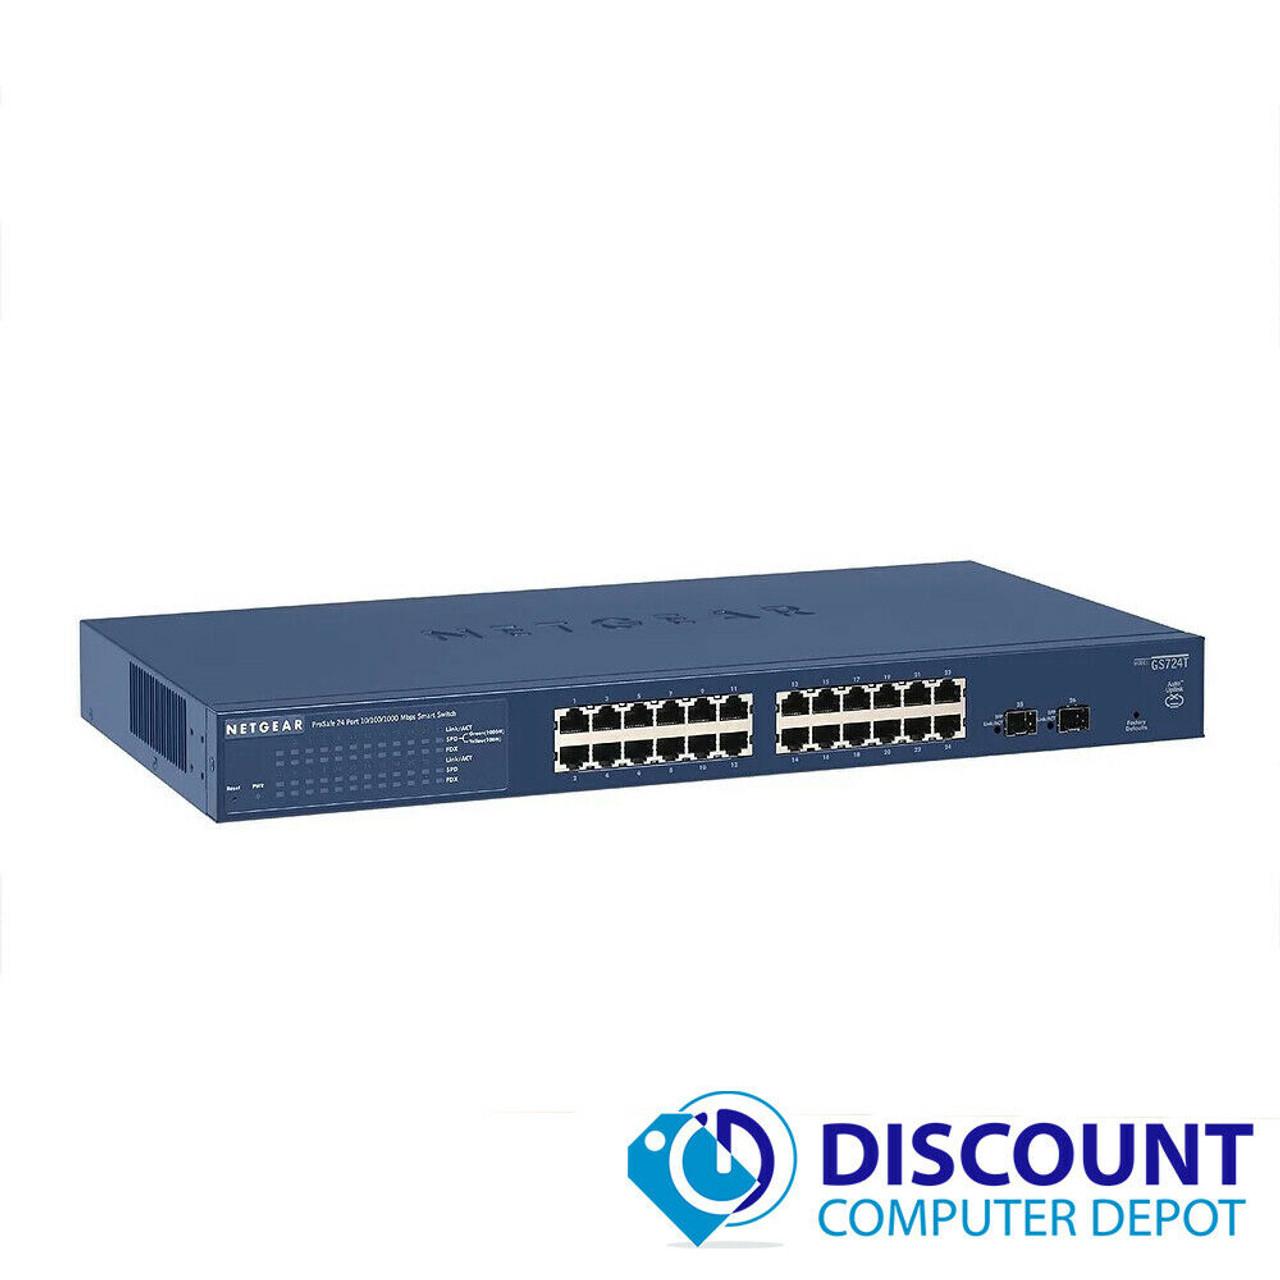 GS724T NETGEAR ProSAFE 24-Port Gigabit Smart Switch Networking ...